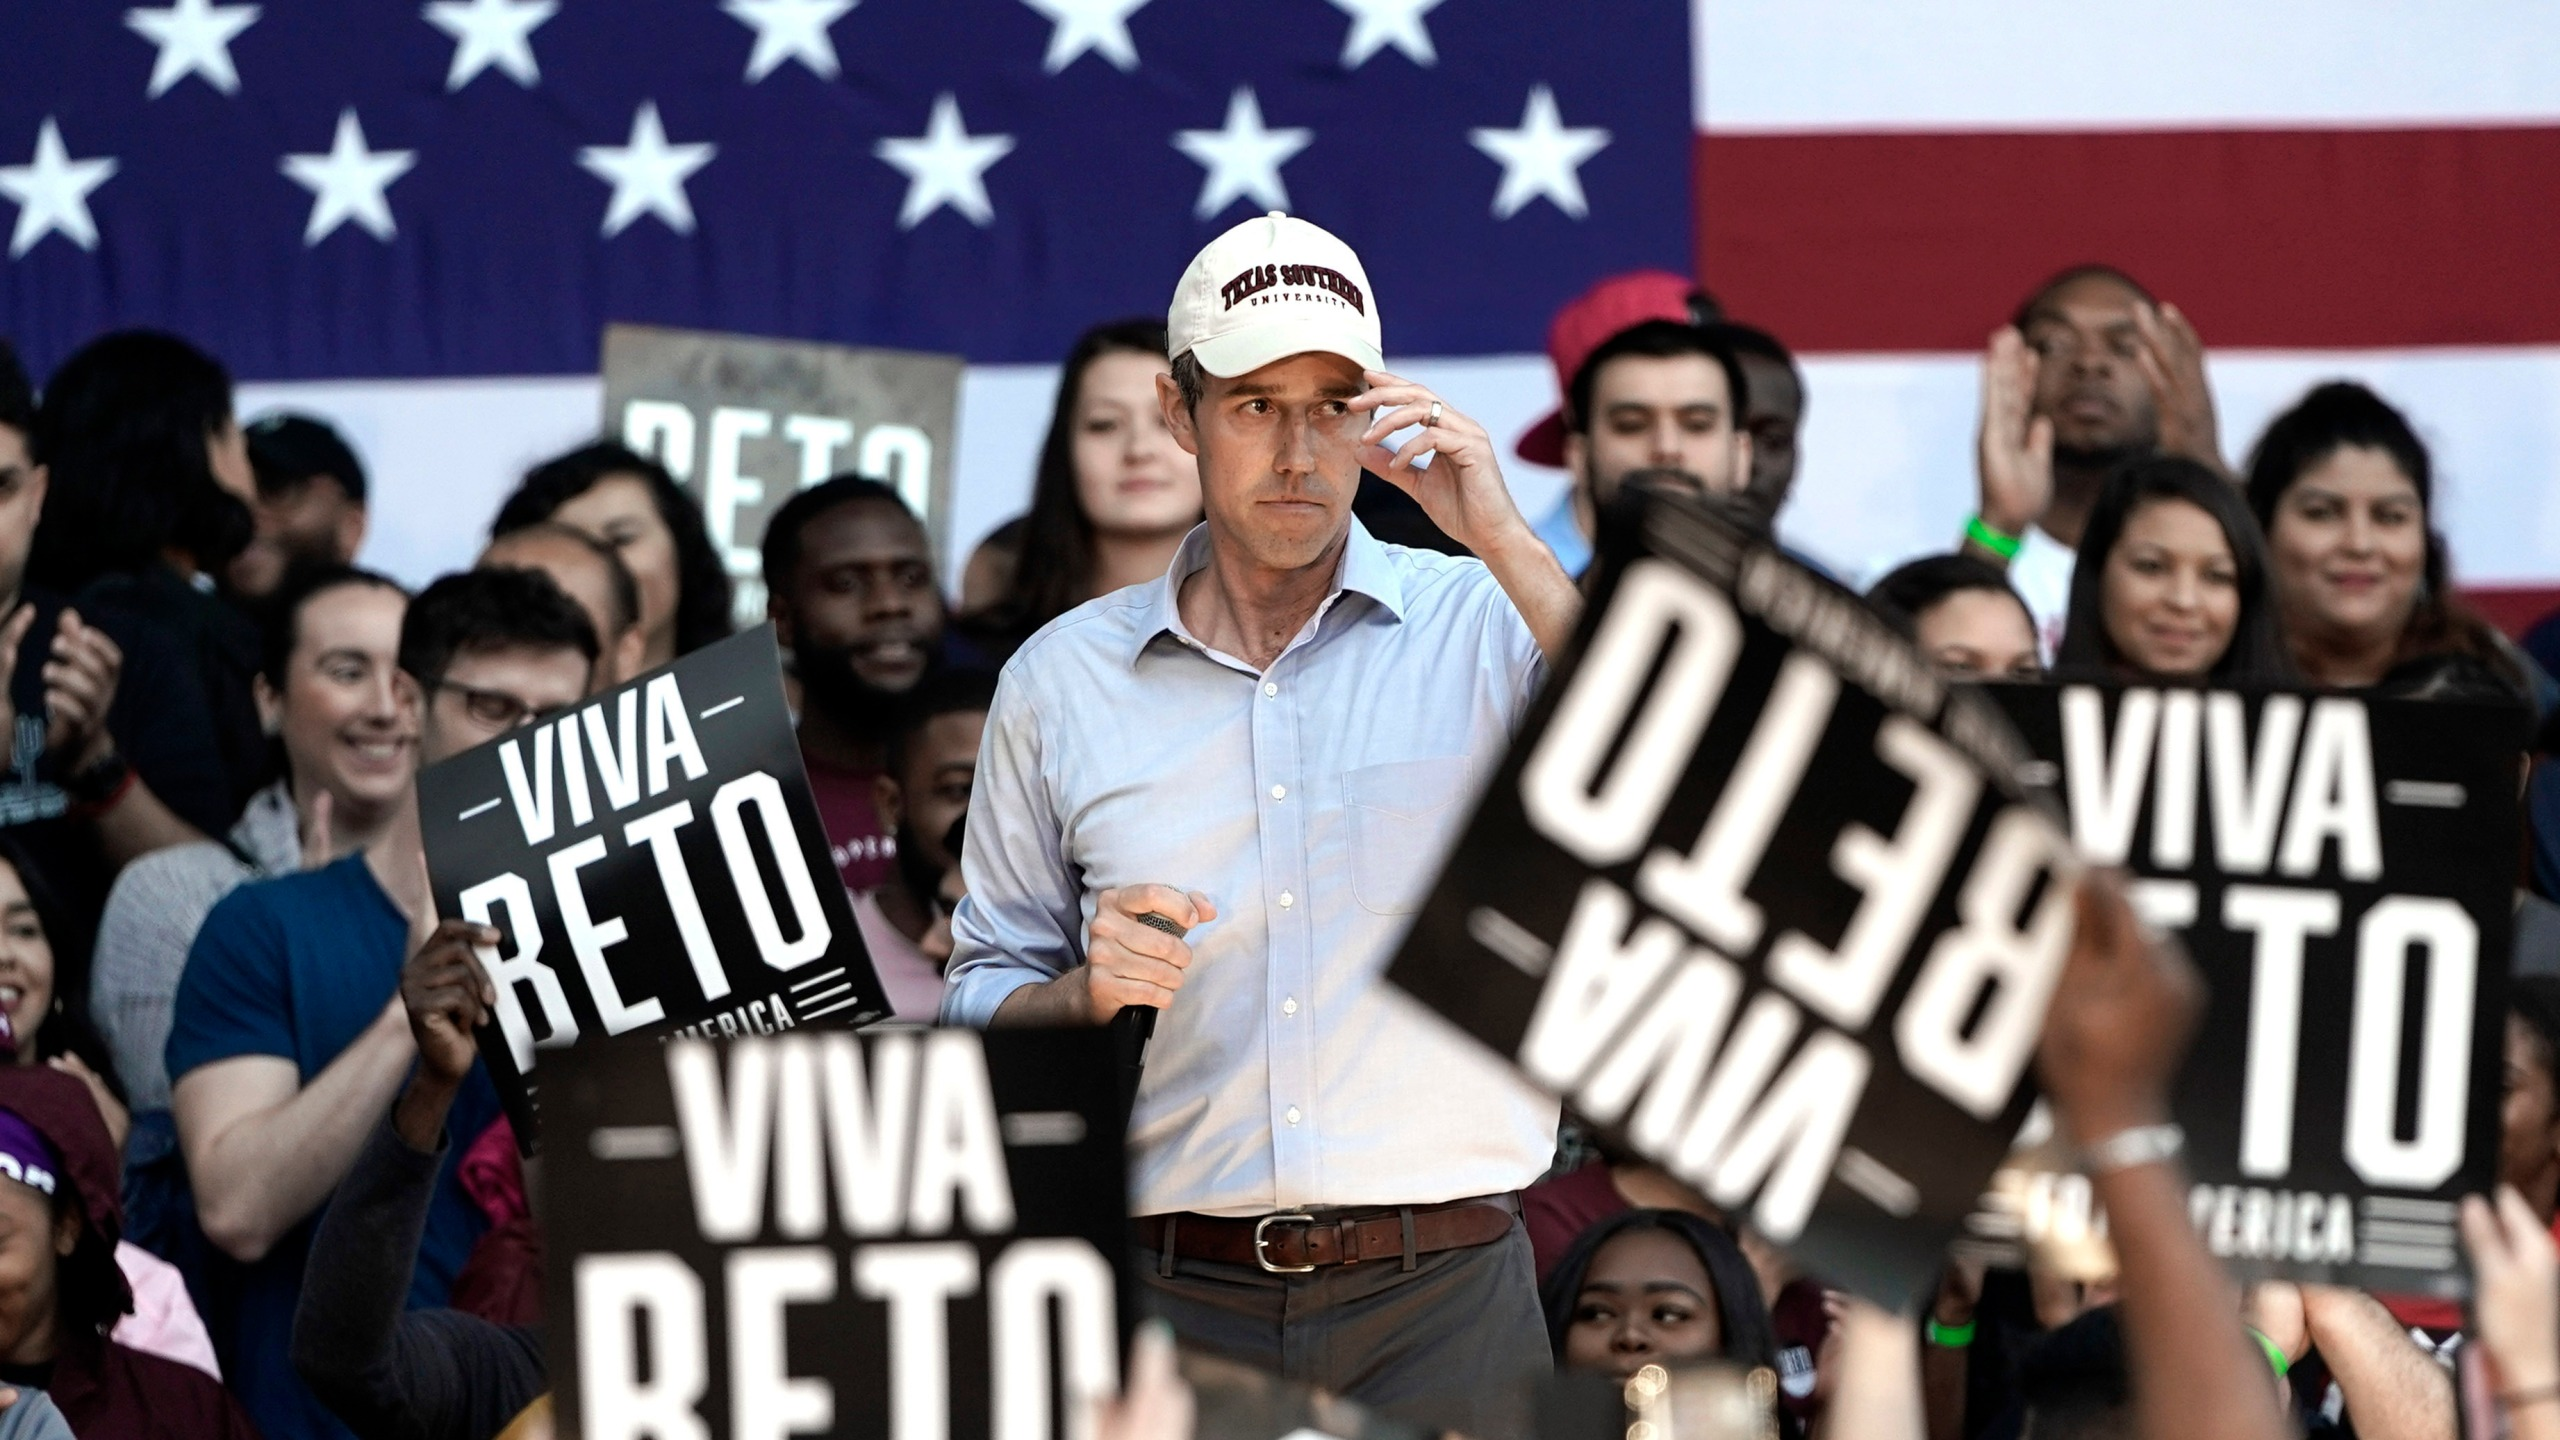 Election_2020_Beto_O'Rourke_92843-159532.jpg08548210